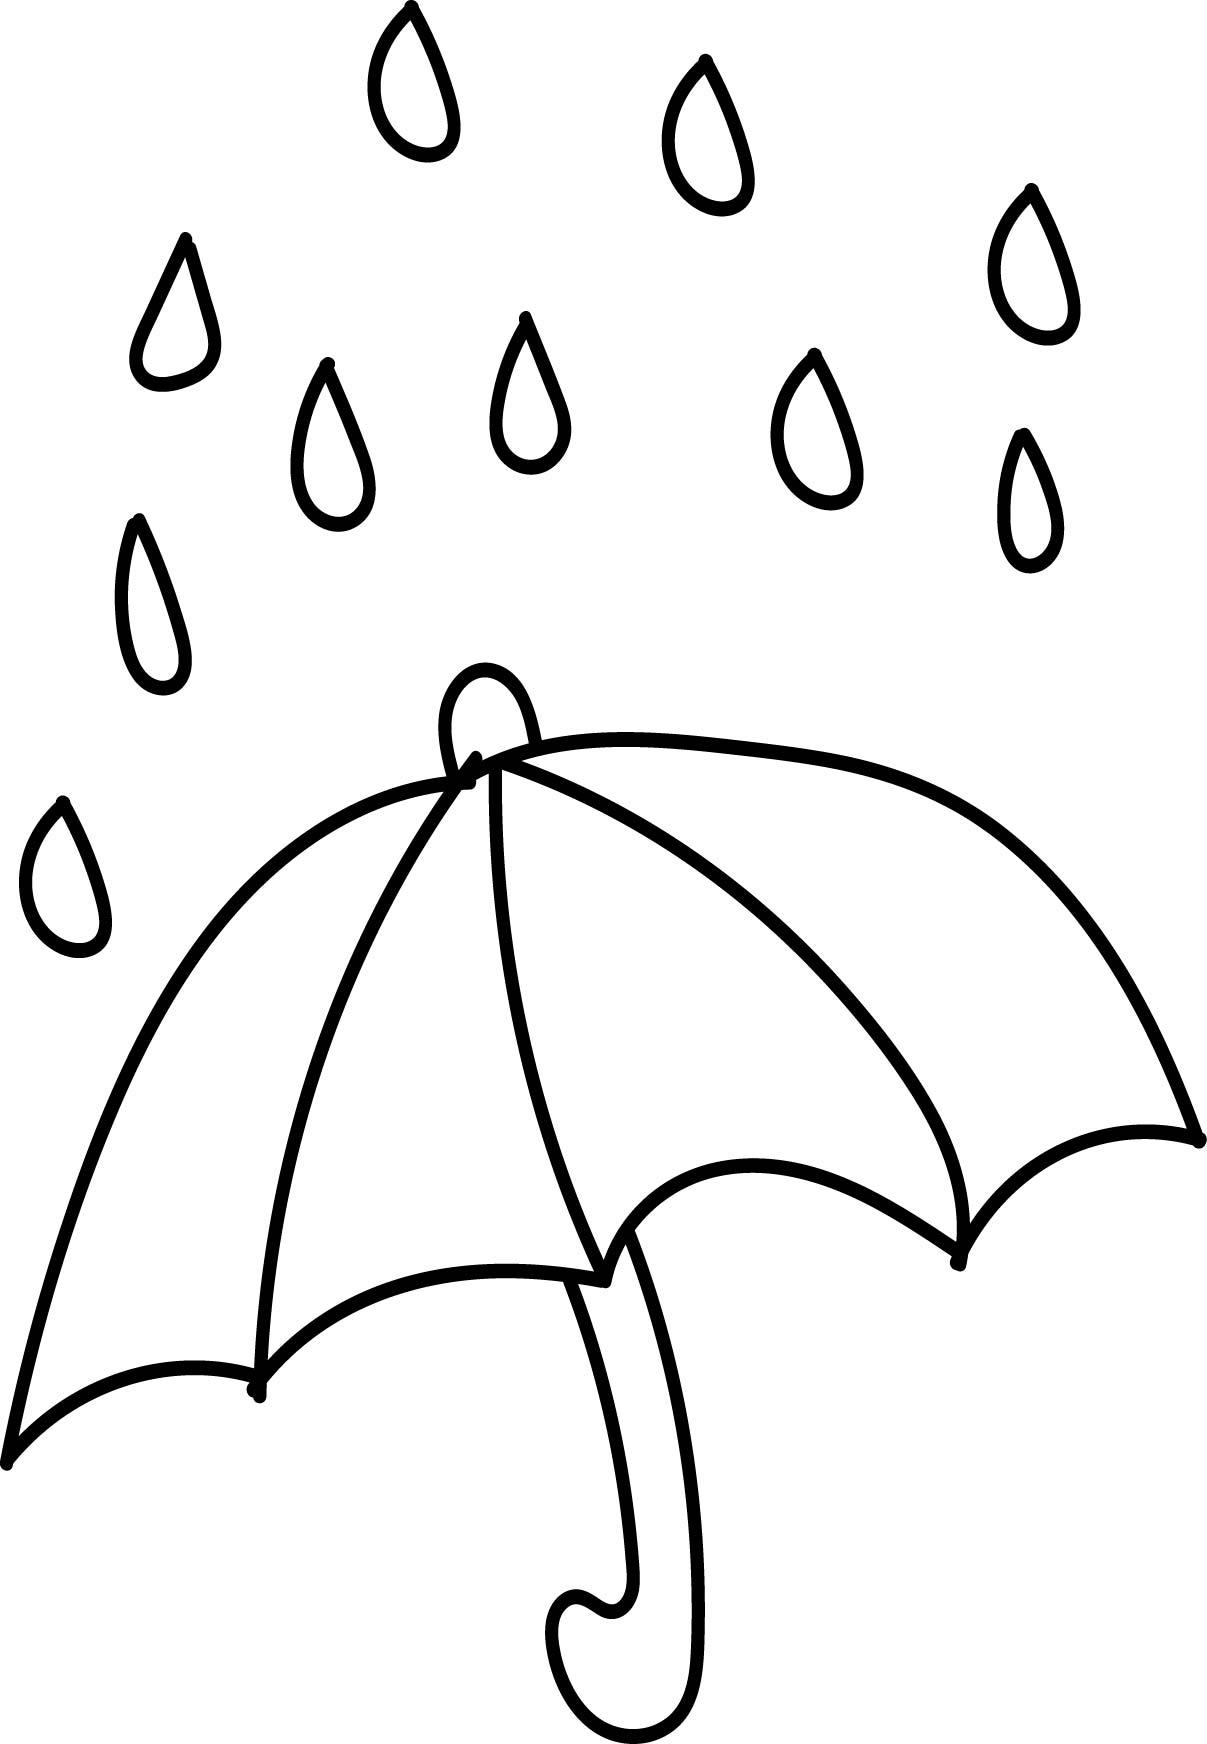 Aftershock Spring Rain Umbrella Free April Coloring Page